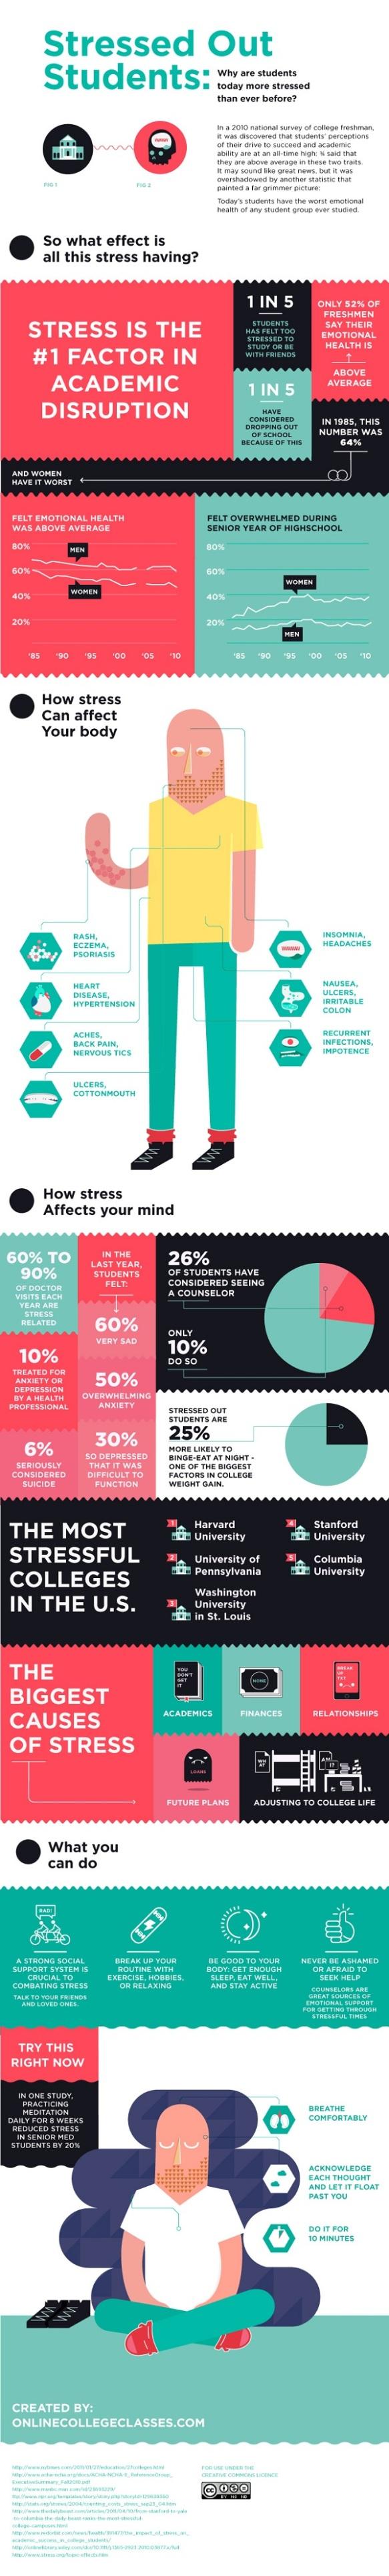 Student stress visual